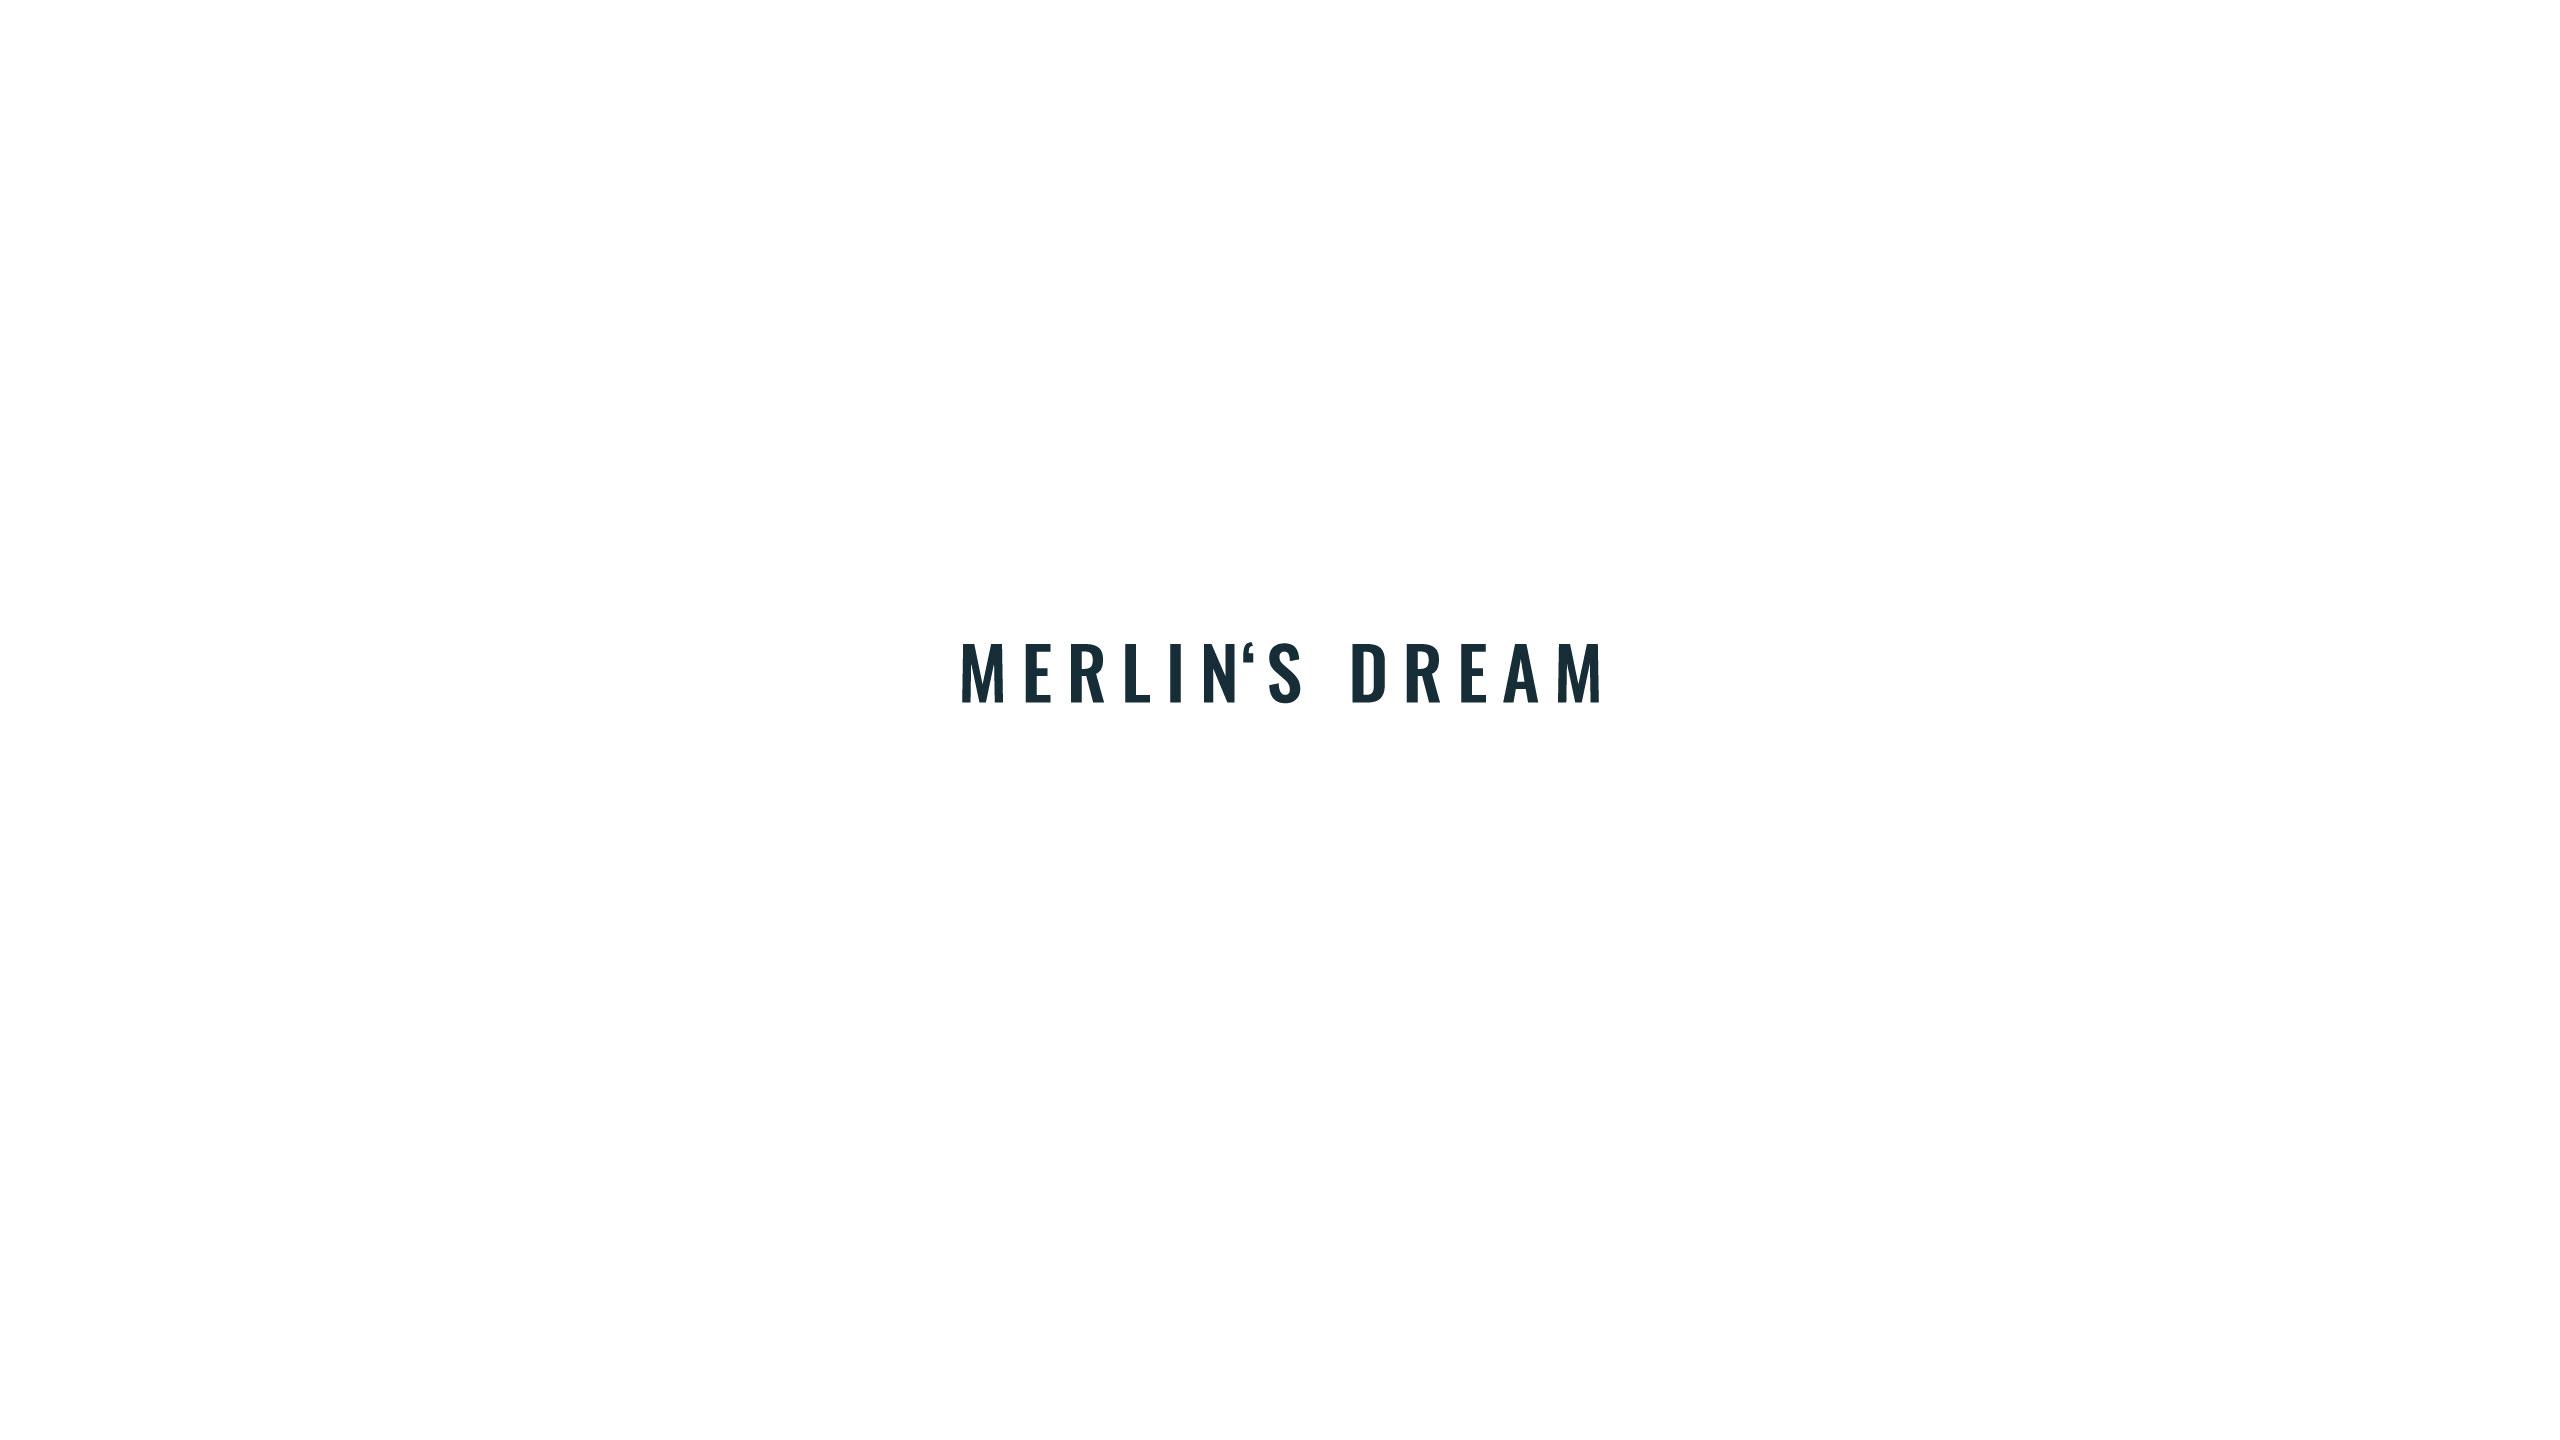 1a_Text_merlins_dream